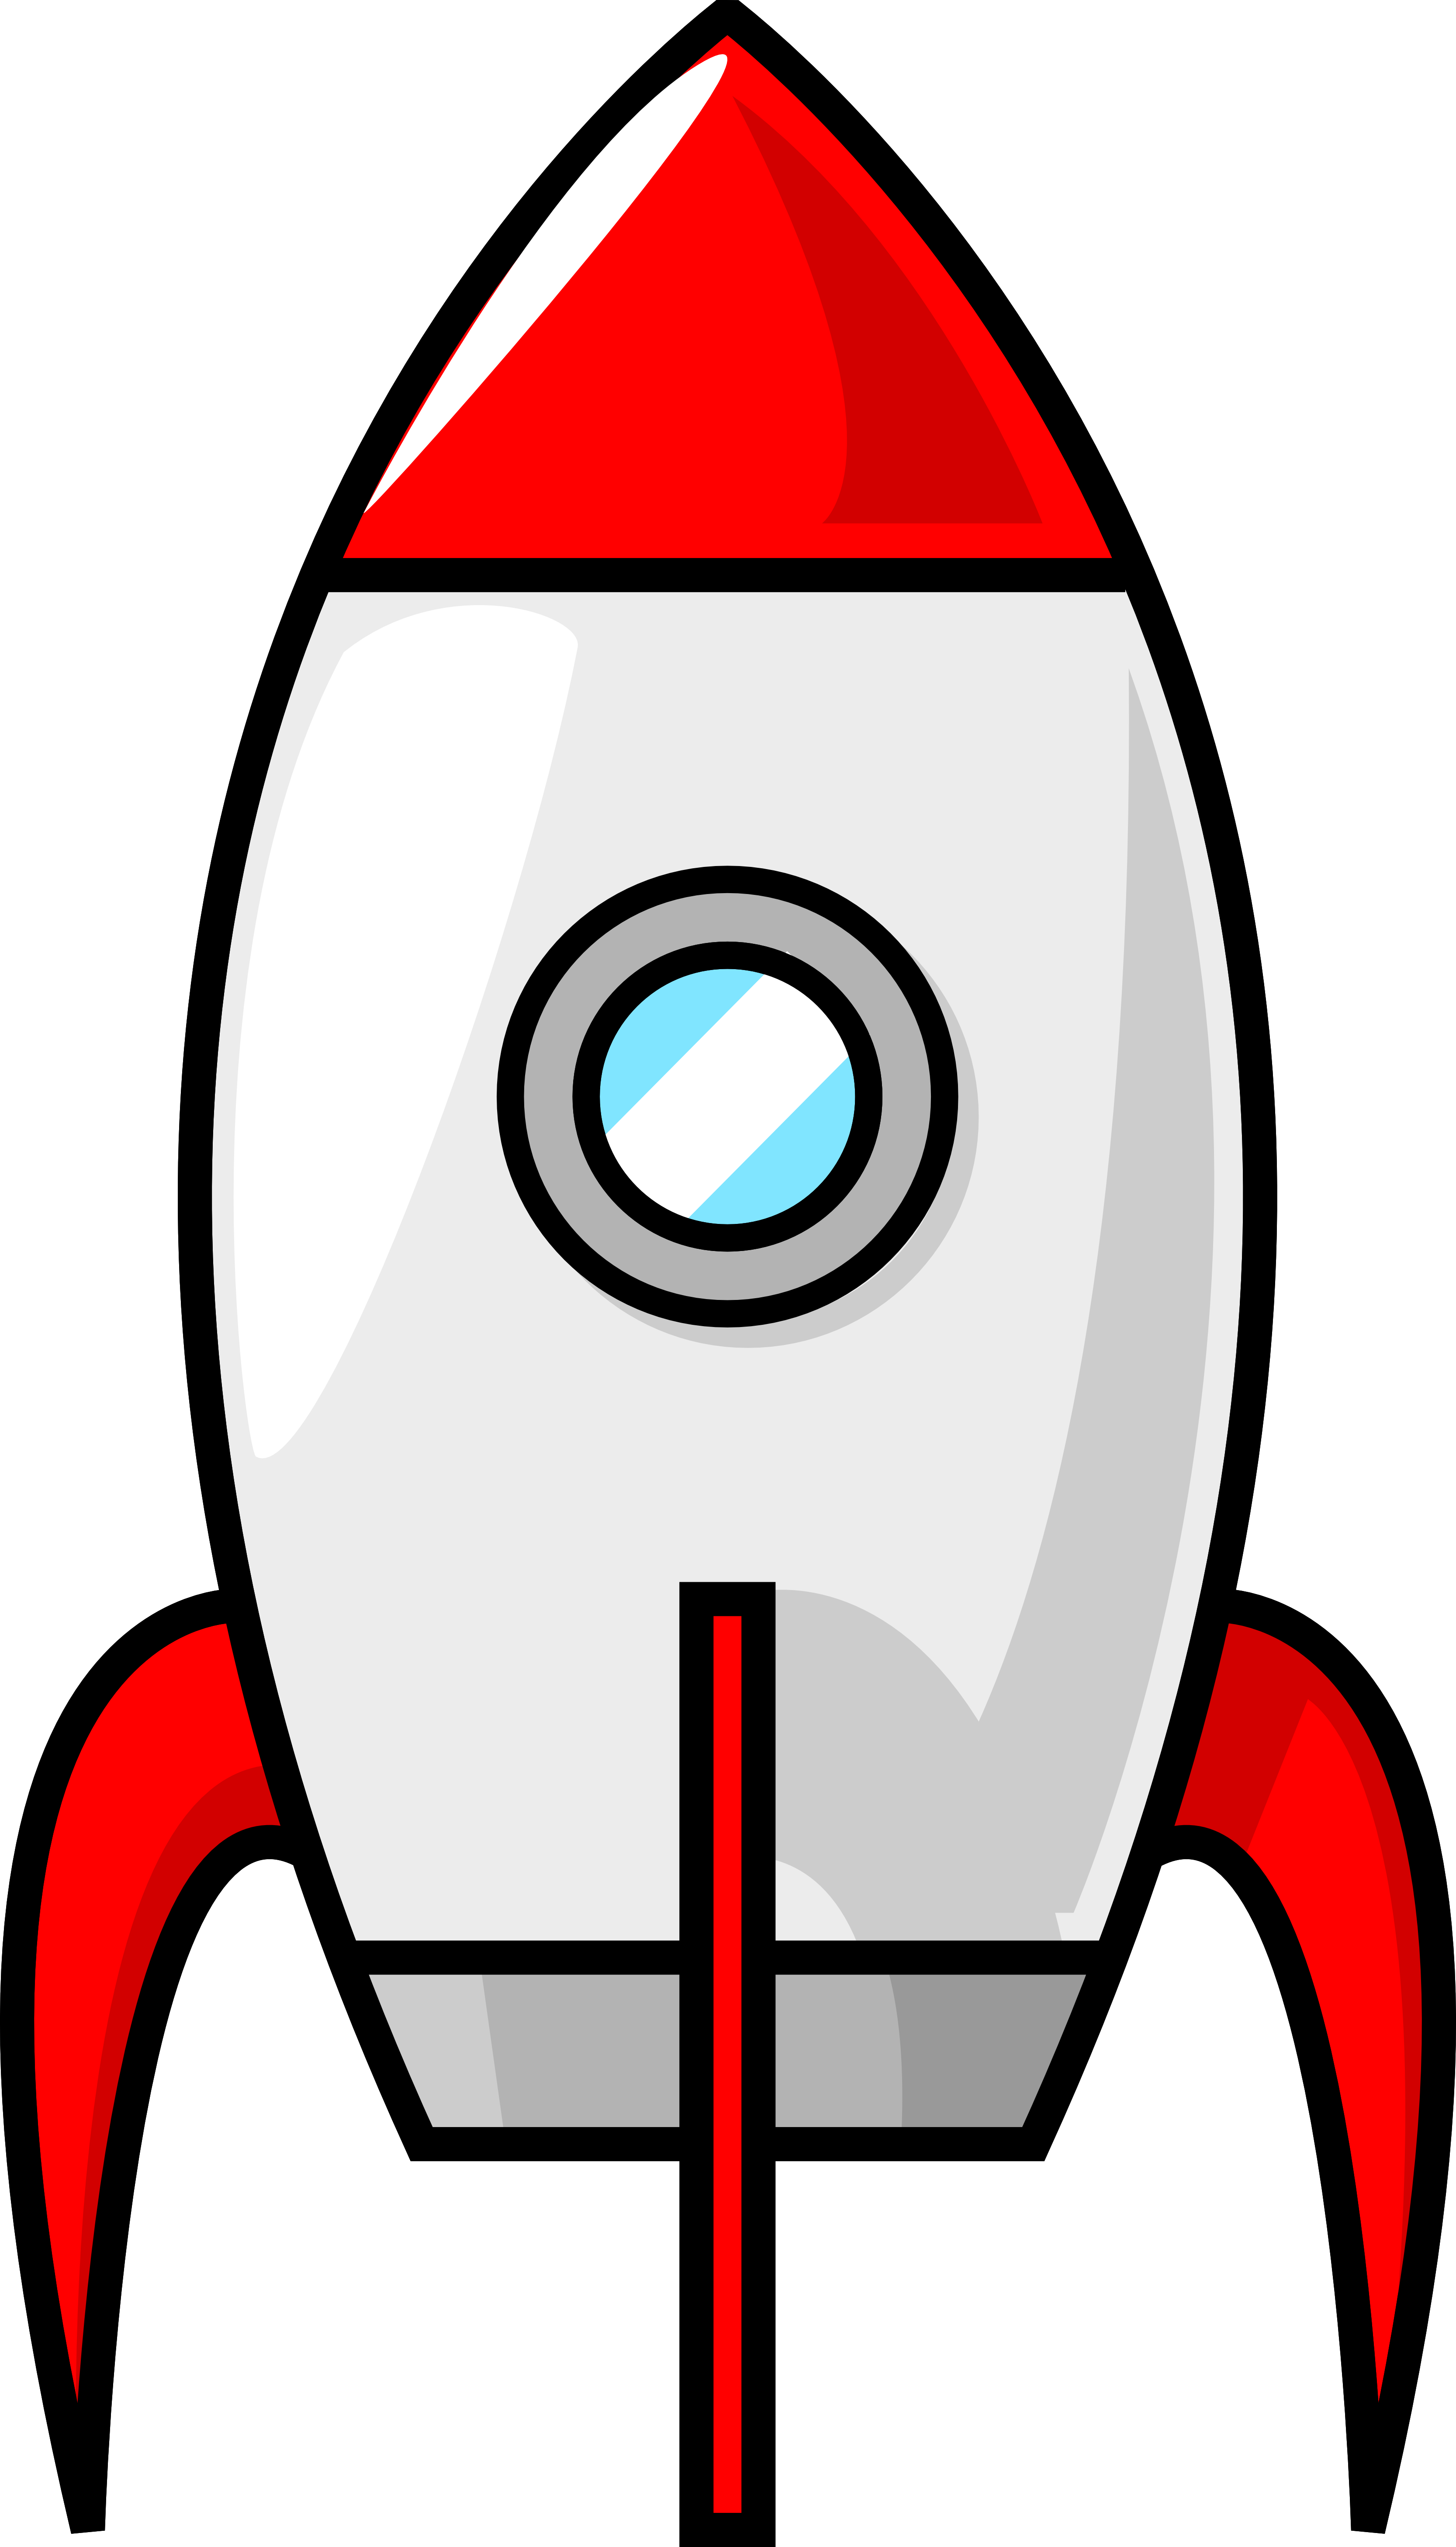 Panda free images rocketclipart. Clipart rocket